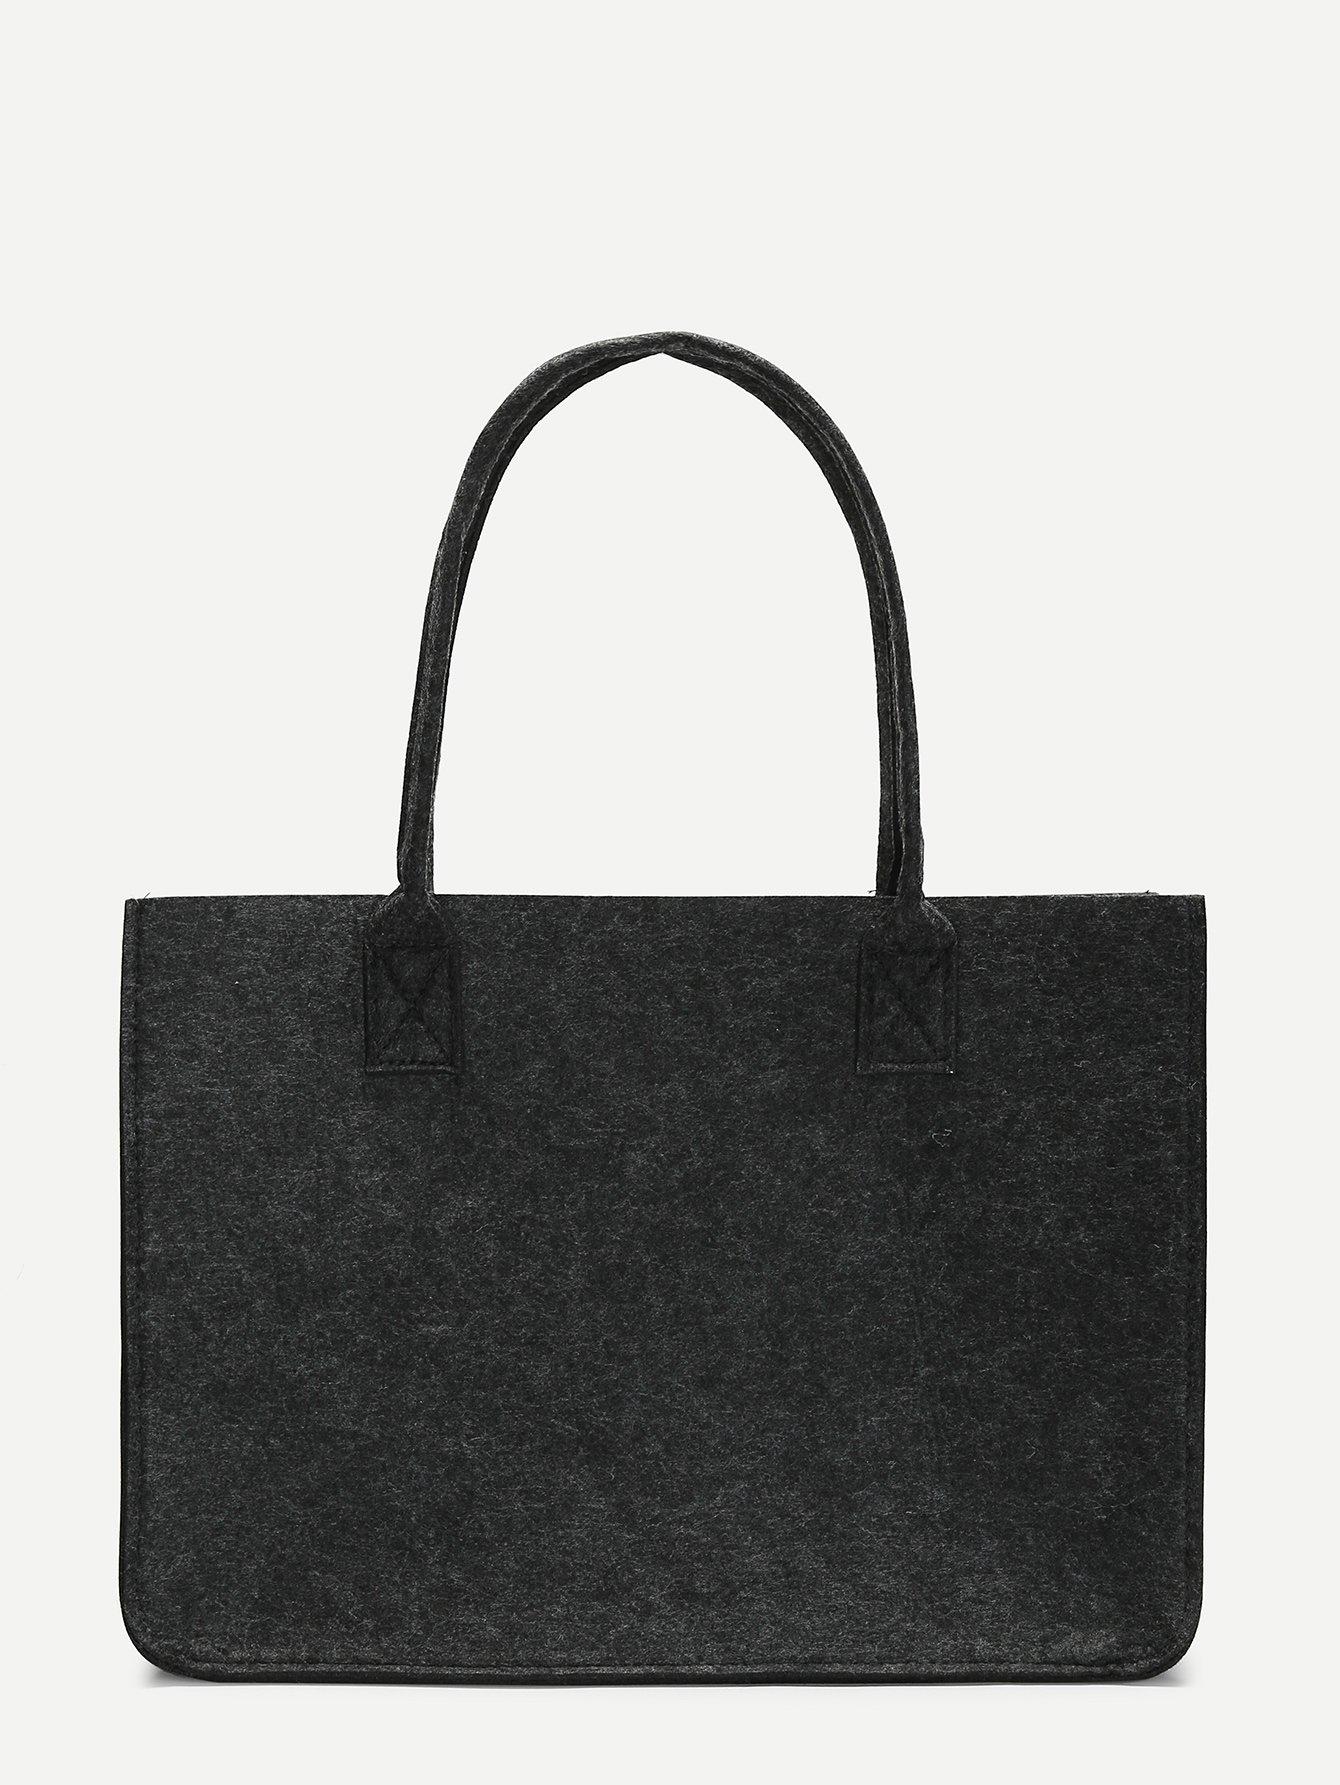 Minimalist Tweed Tote Bag